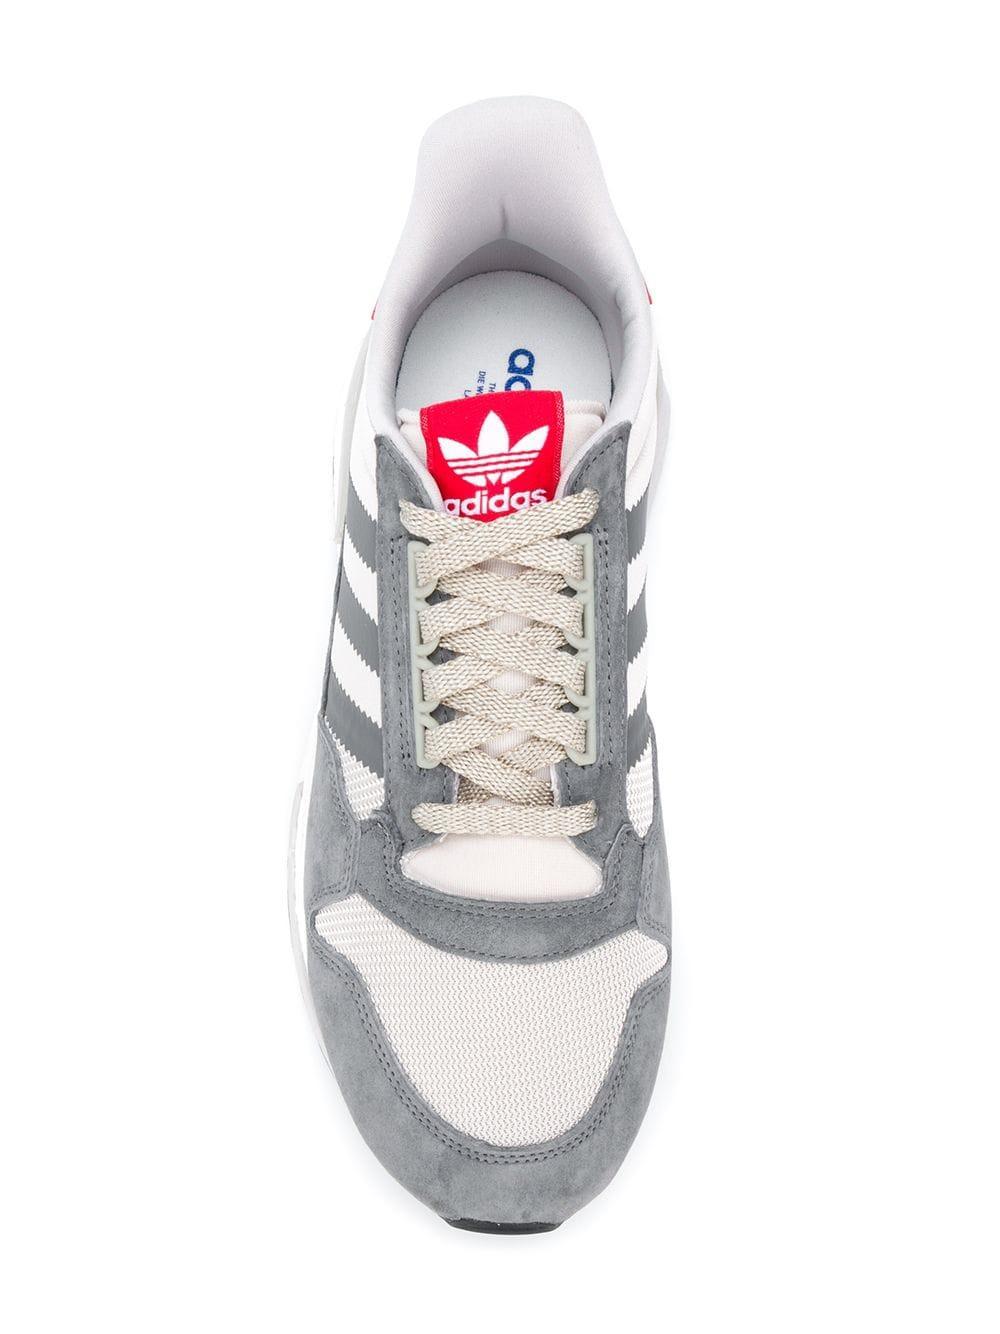 4ec581a47bfc Adidas - Gray Zx 500 Rm Sneakers for Men - Lyst. View fullscreen